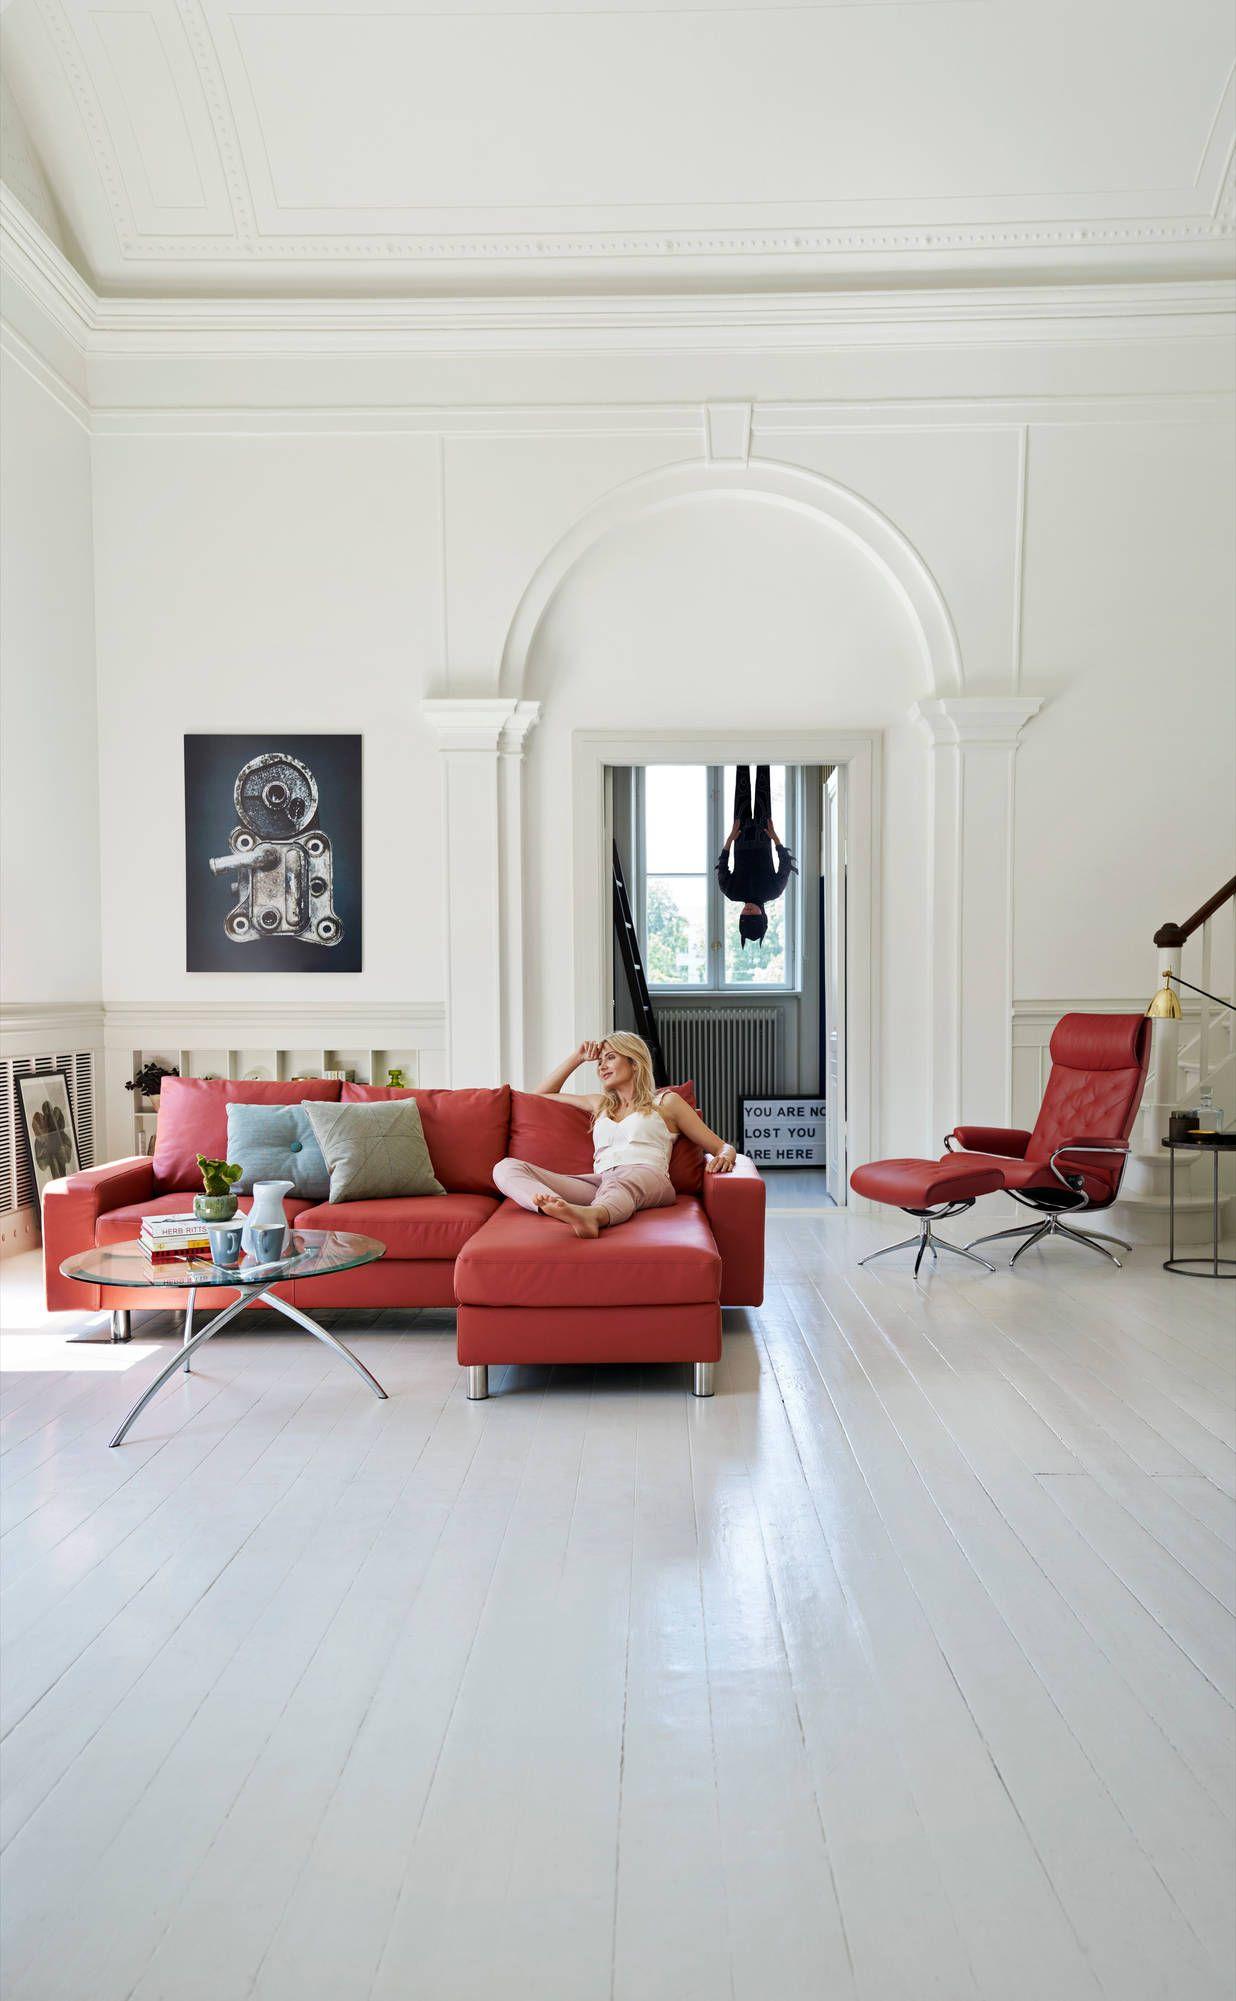 kurze auszeit stressless sofa e200 als 2er mit longseat und stressless metro relaxsessel. Black Bedroom Furniture Sets. Home Design Ideas